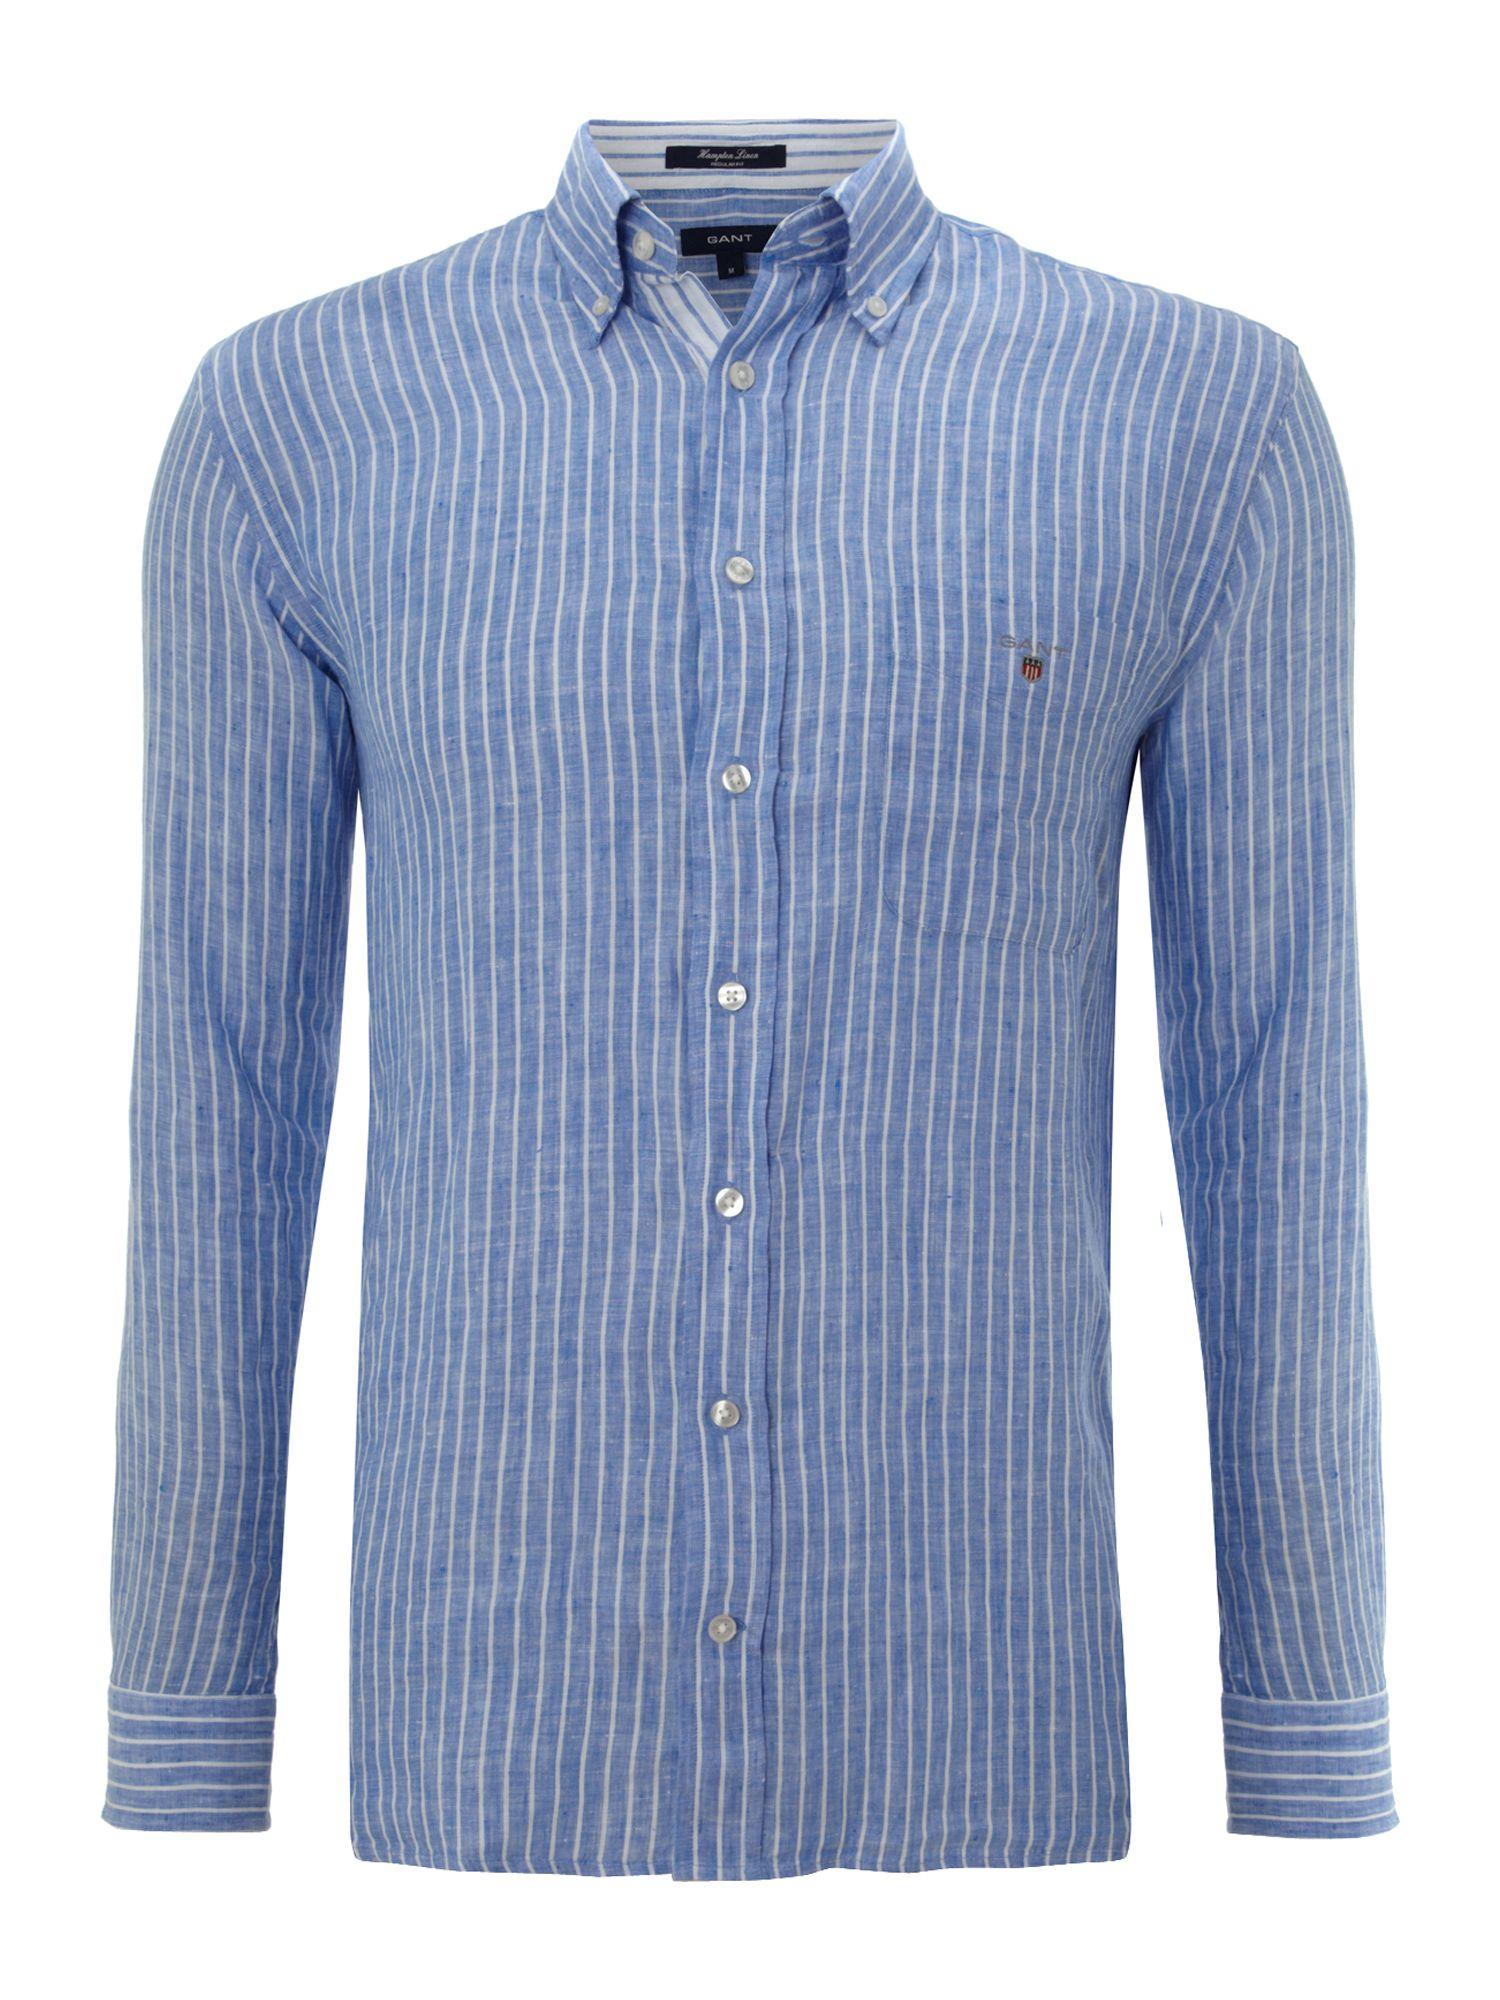 Gant long sleeve hampton linen shirt in blue for men lyst for Linen long sleeve shirt